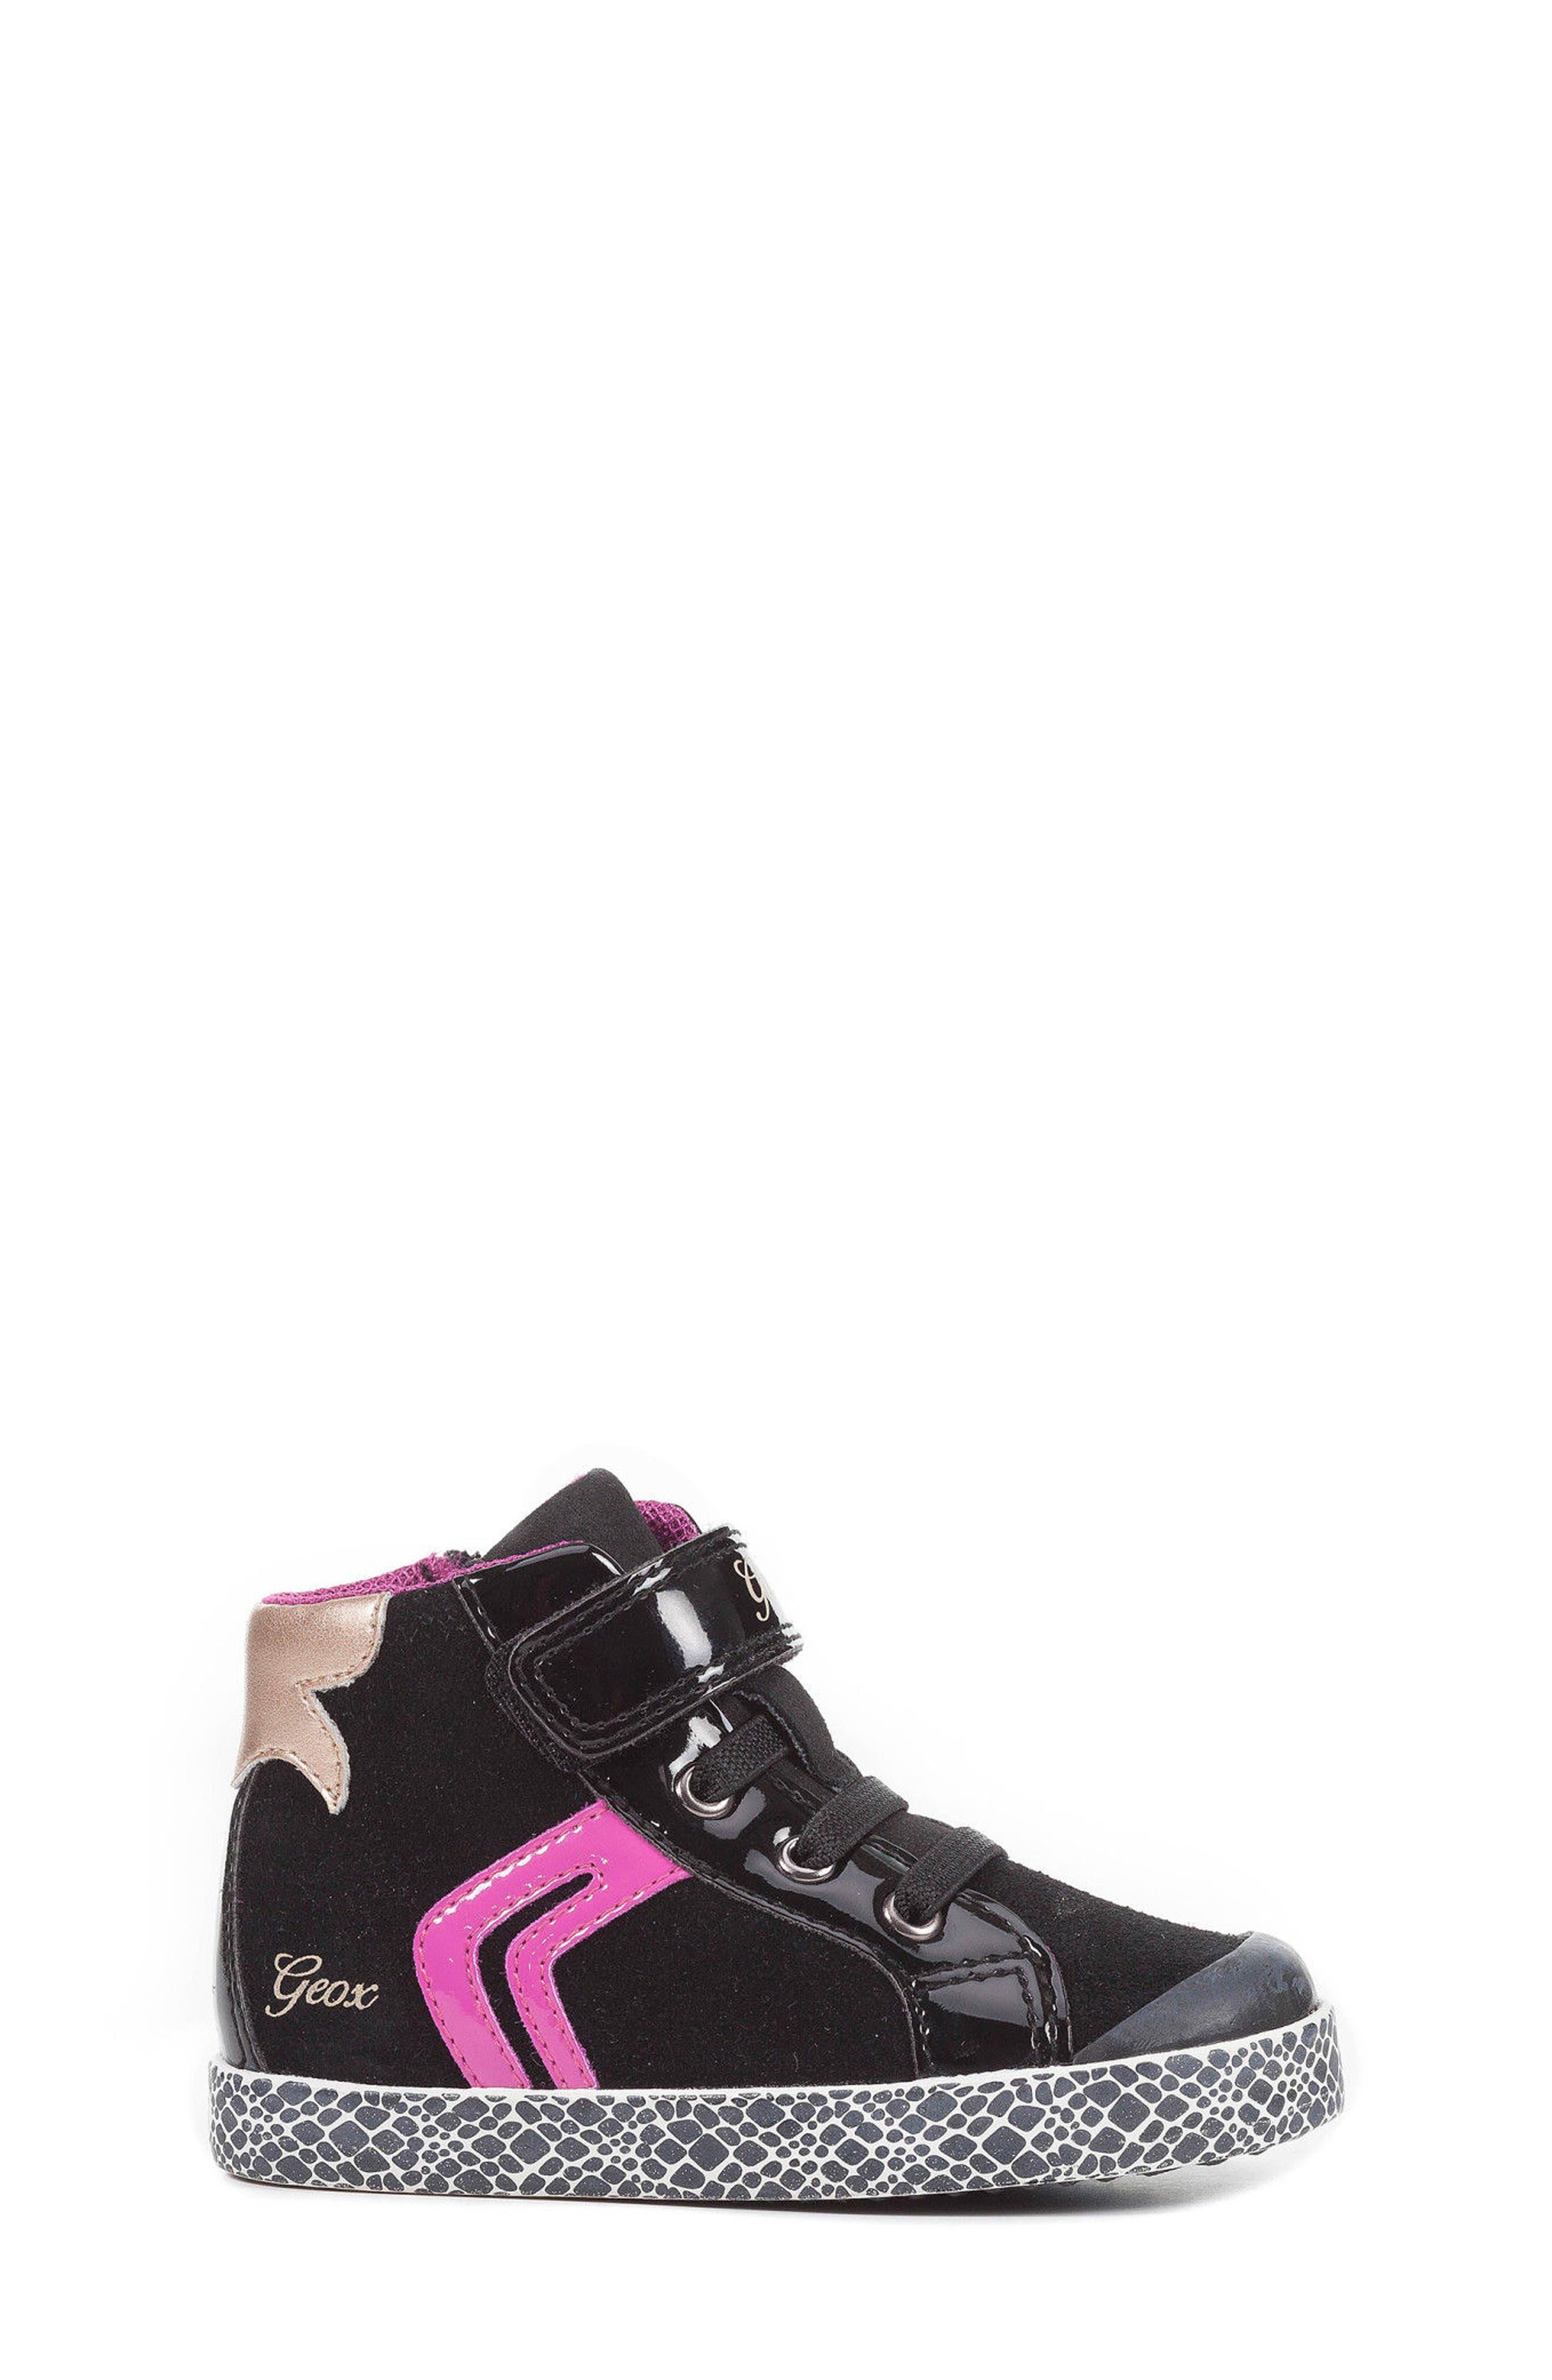 Kiwi Girl High Top Sneaker,                             Alternate thumbnail 3, color,                             Black/ Cyclamen